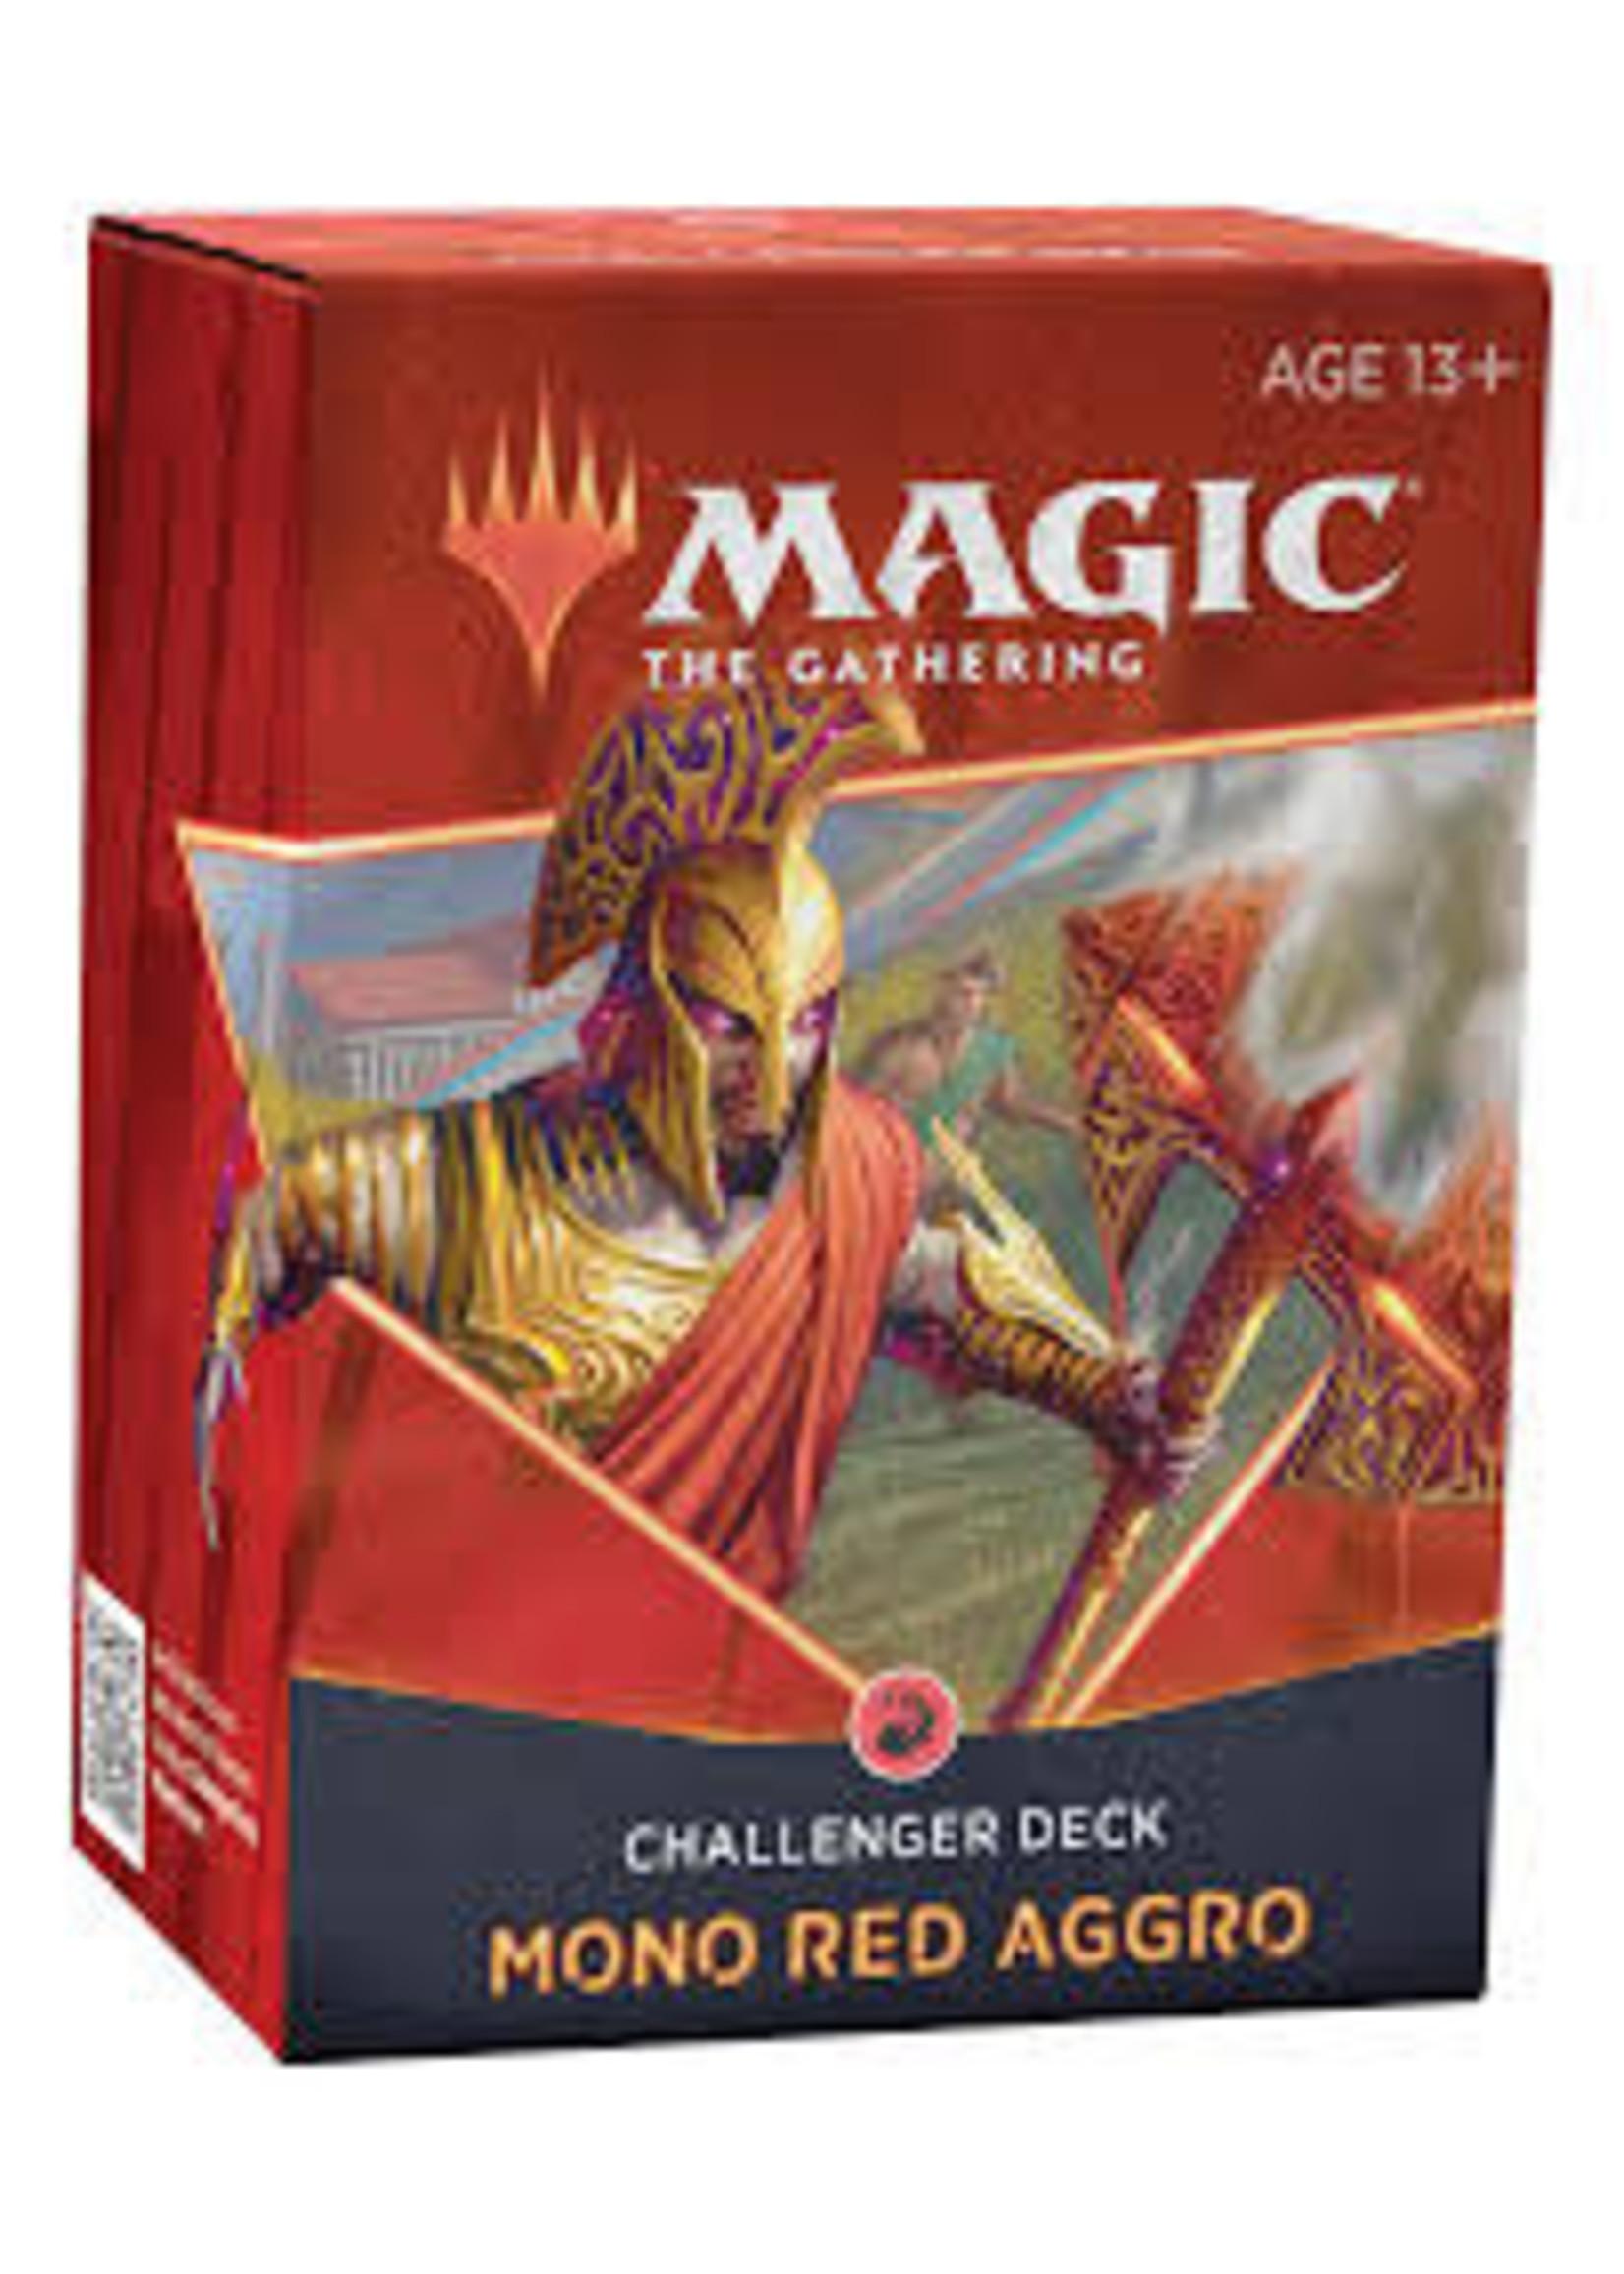 Magic: The Gathering Challenger Deck 2021 single